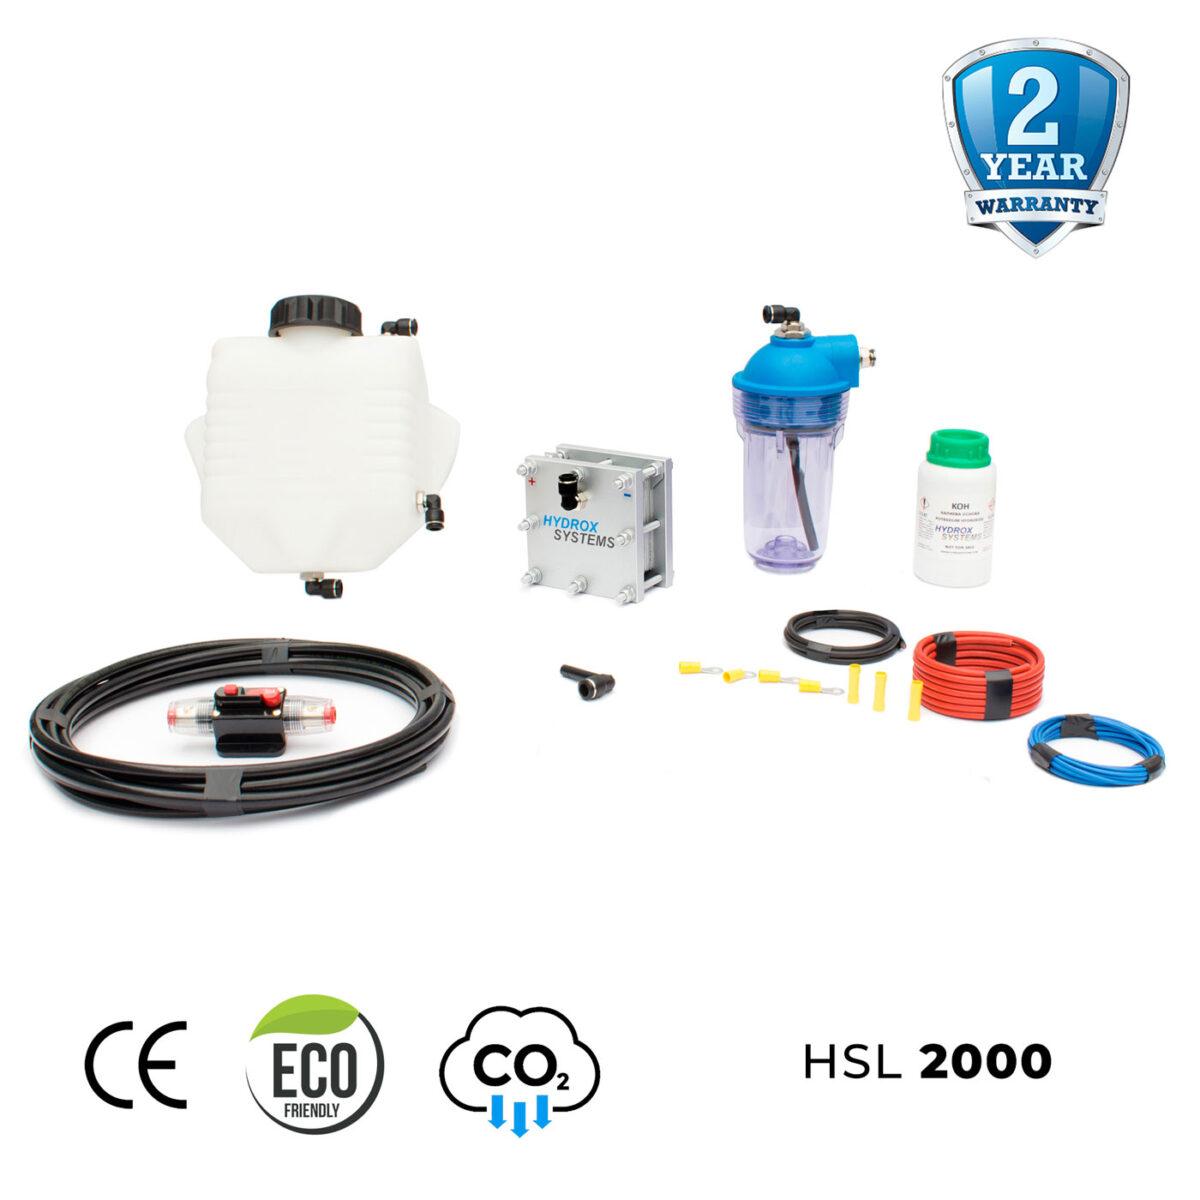 emission reduction device